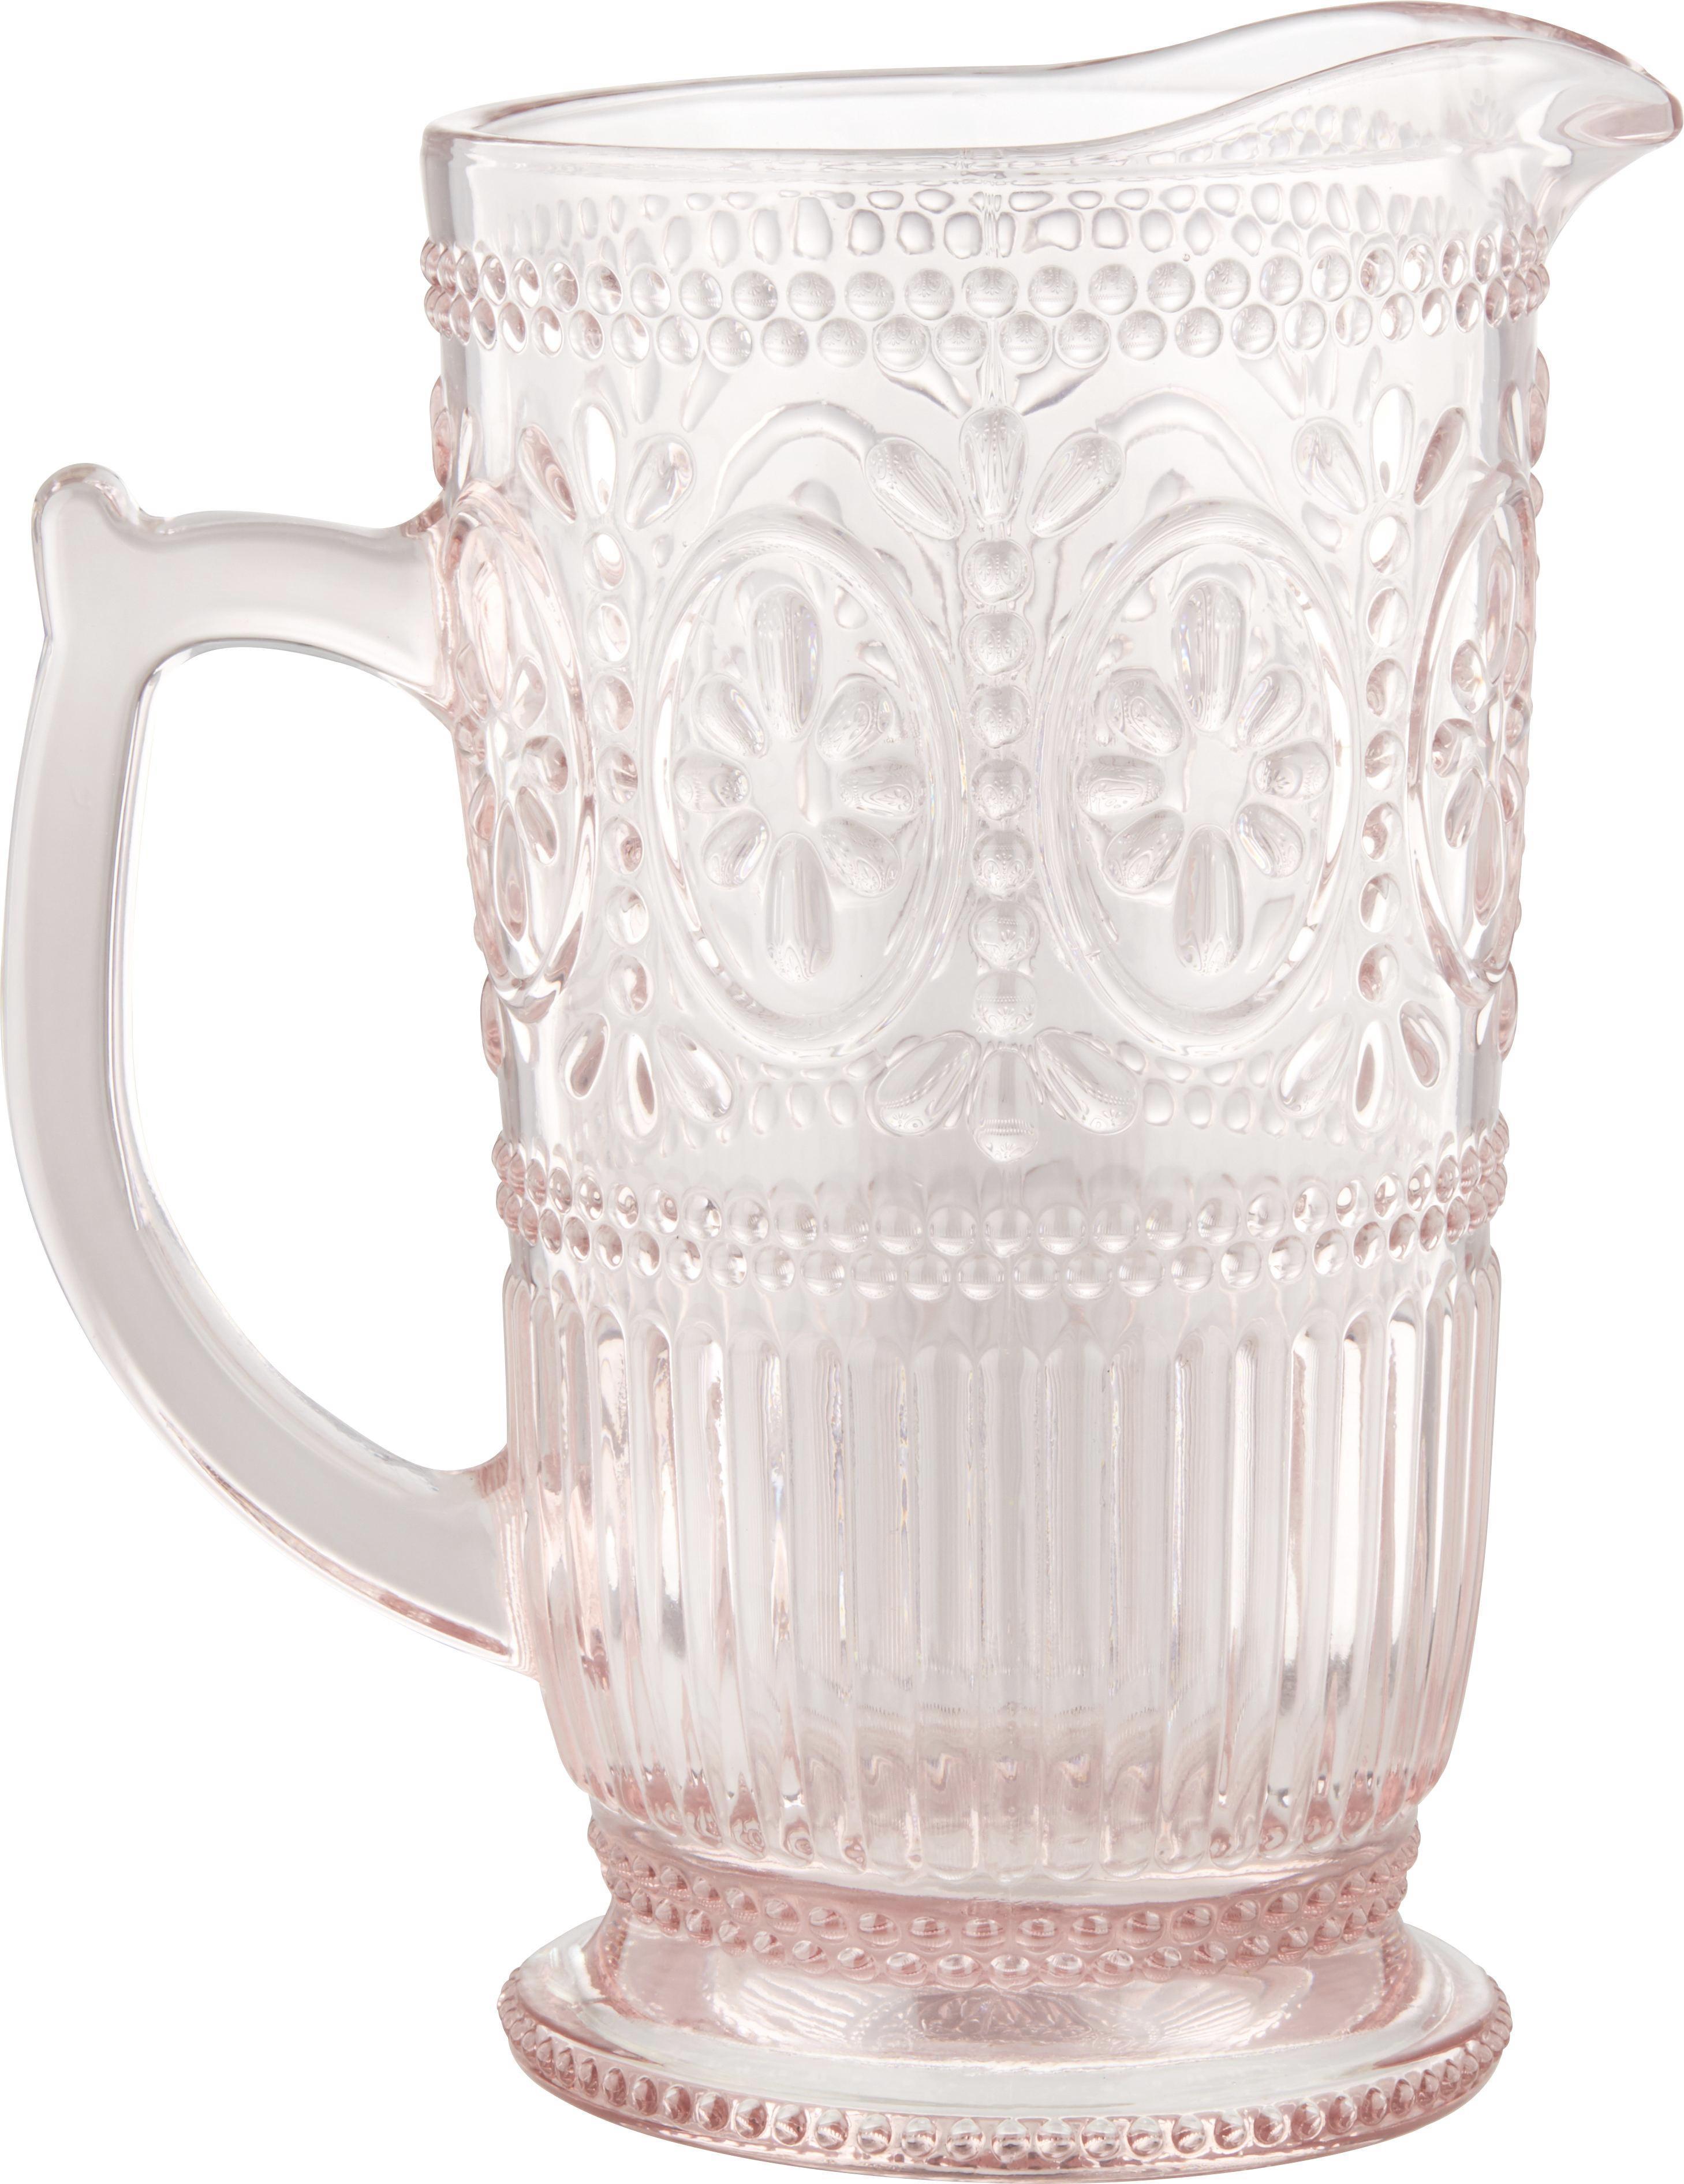 Glaskrug Remy in Rosa, ca. 1375ml - Rosa, ROMANTIK / LANDHAUS, Glas (12-18/22,8cm) - ZANDIARA